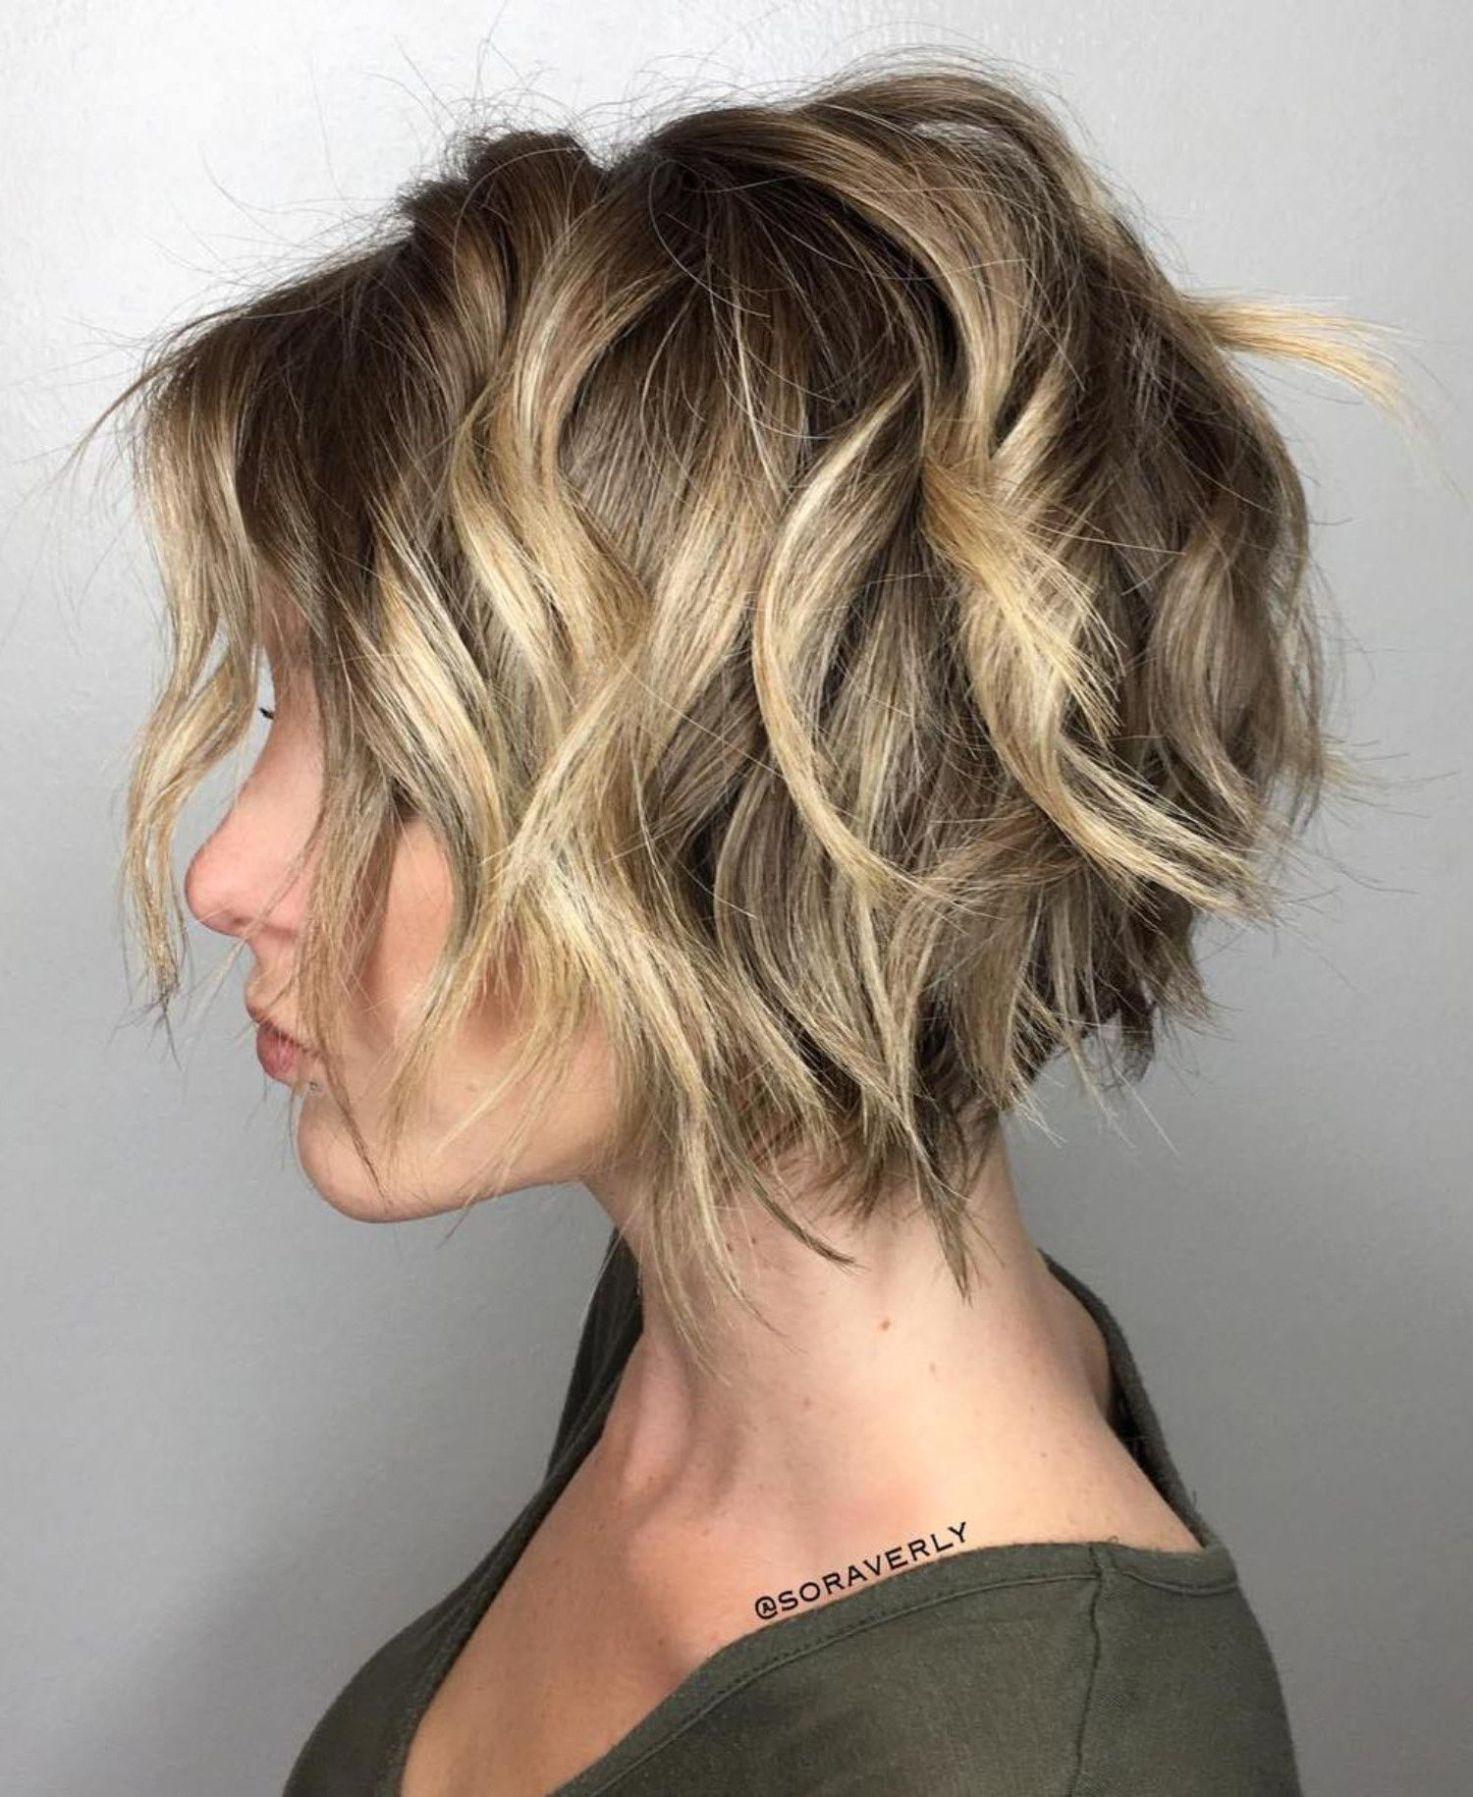 100 Mind Blowing Short Hairstyles For Fine Hair Fryzury Balejaz